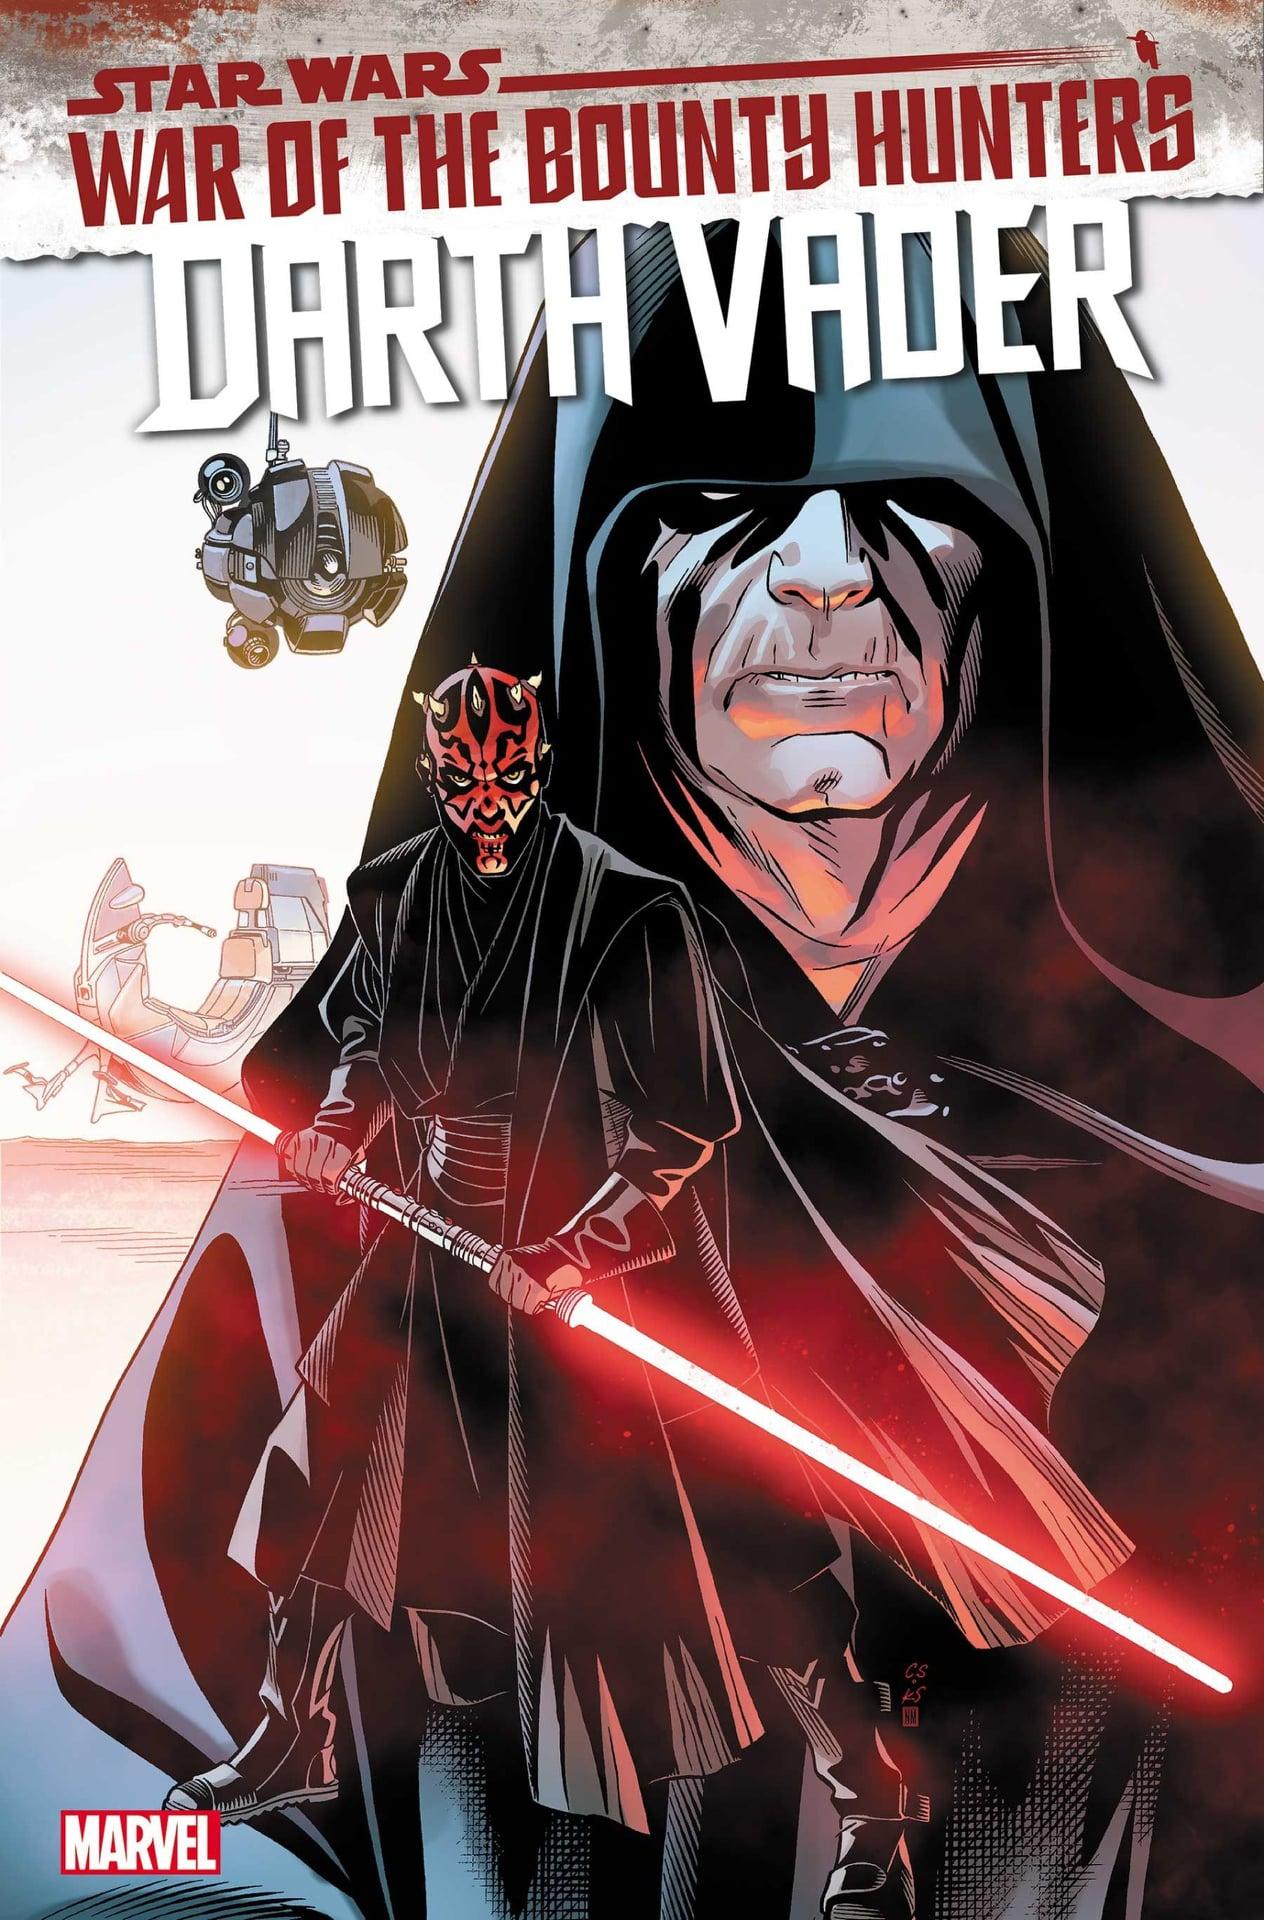 Star Wars: Darth Vader 15 (2020) - Sprouse Variant